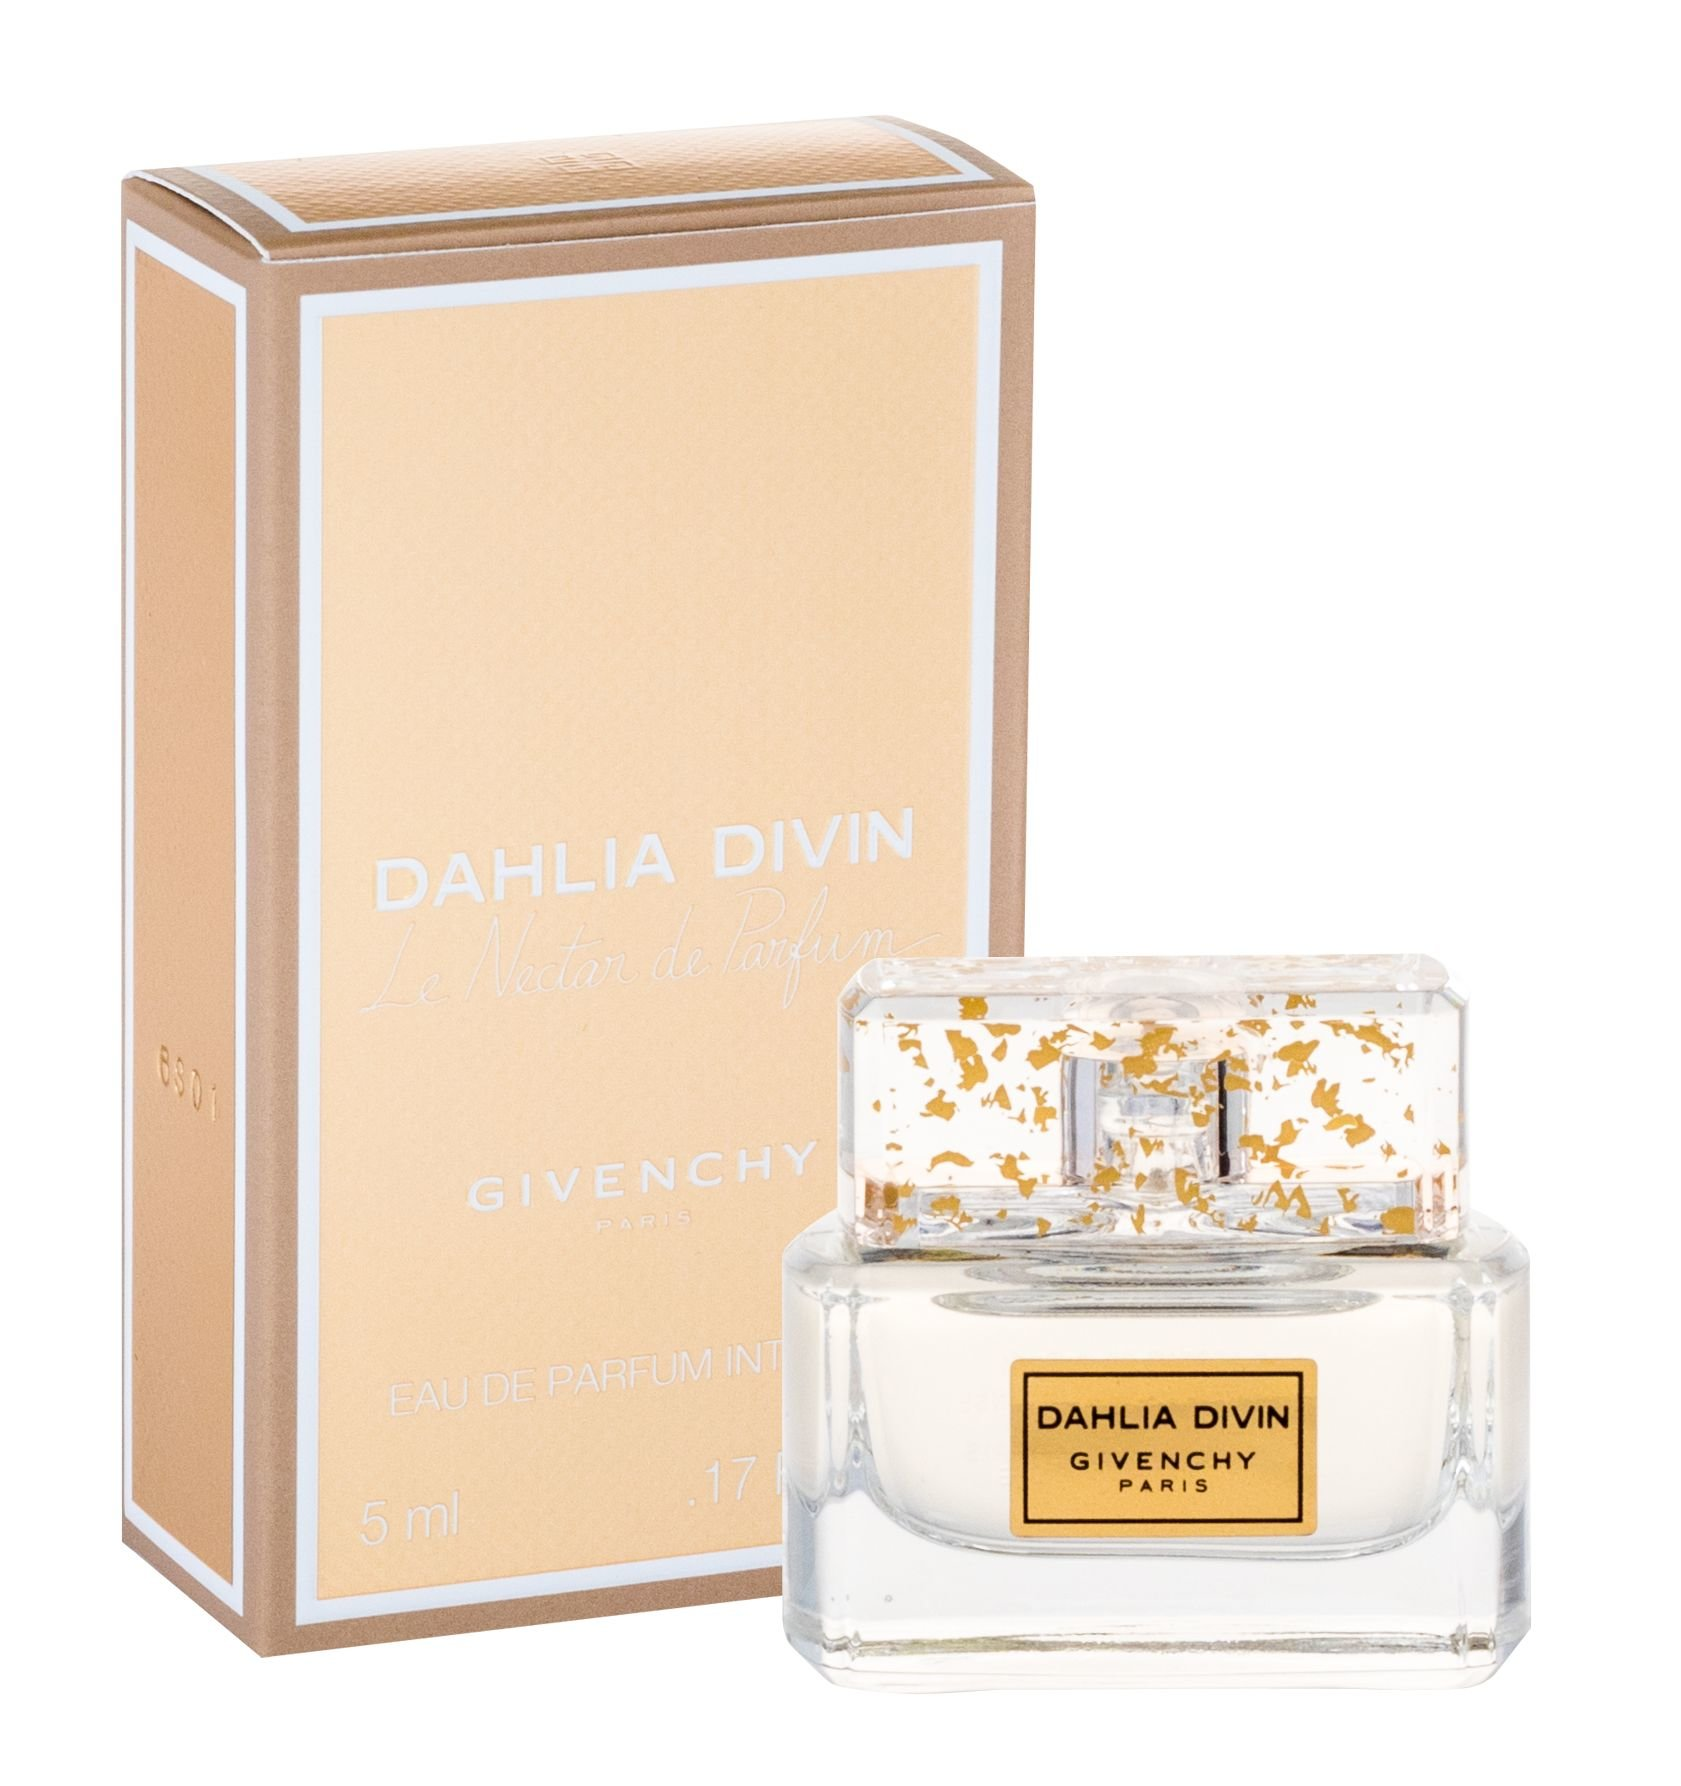 Givenchy Dahlia Divin EDP 5ml  Le Nectar de Parfum